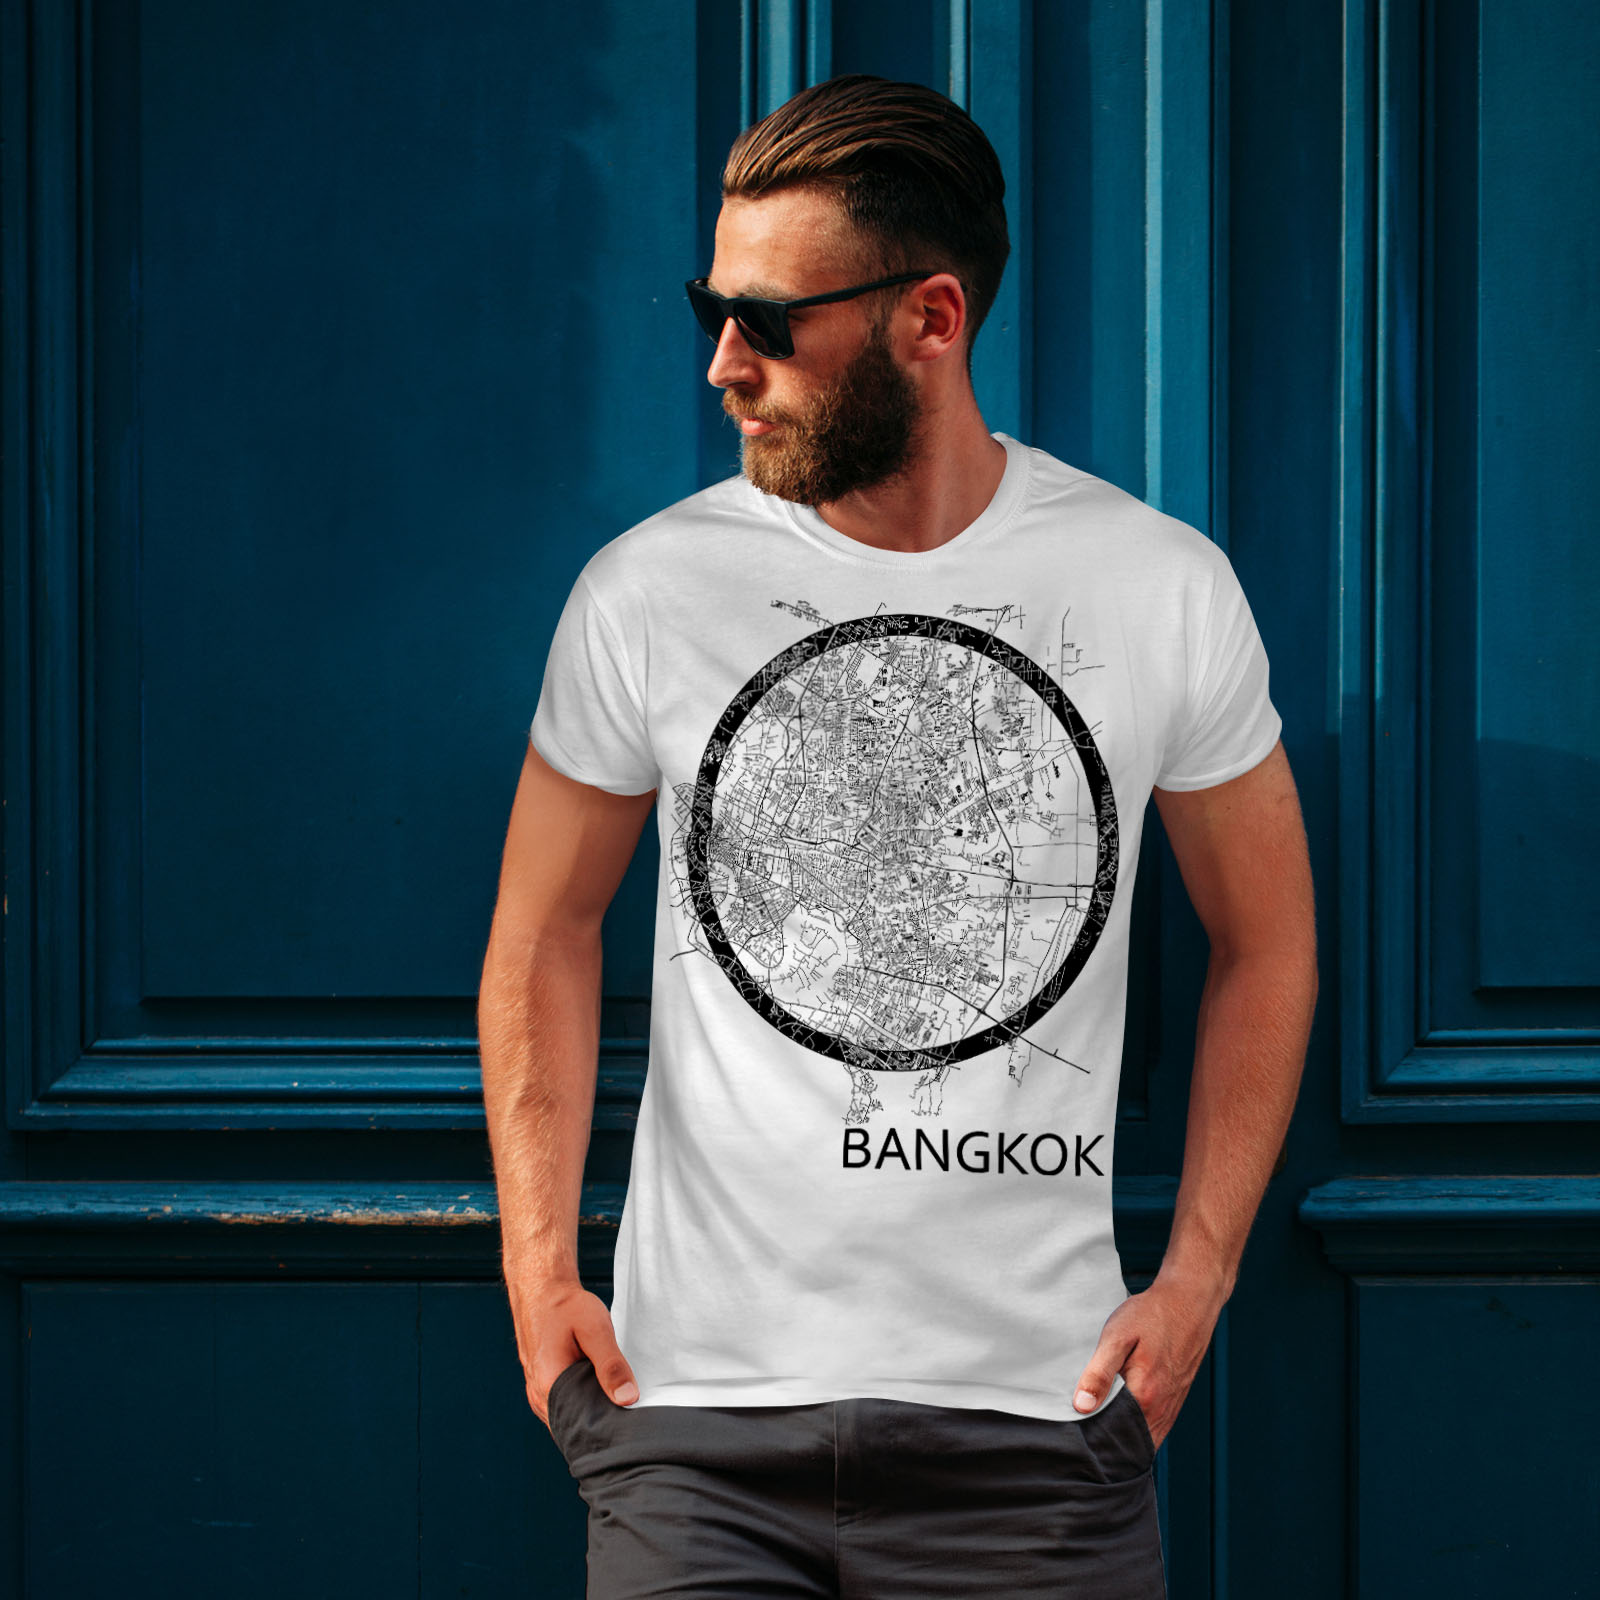 Wellcoda-Thailand-Bangkok-Map-Mens-T-shirt-Big-Graphic-Design-Printed-Tee